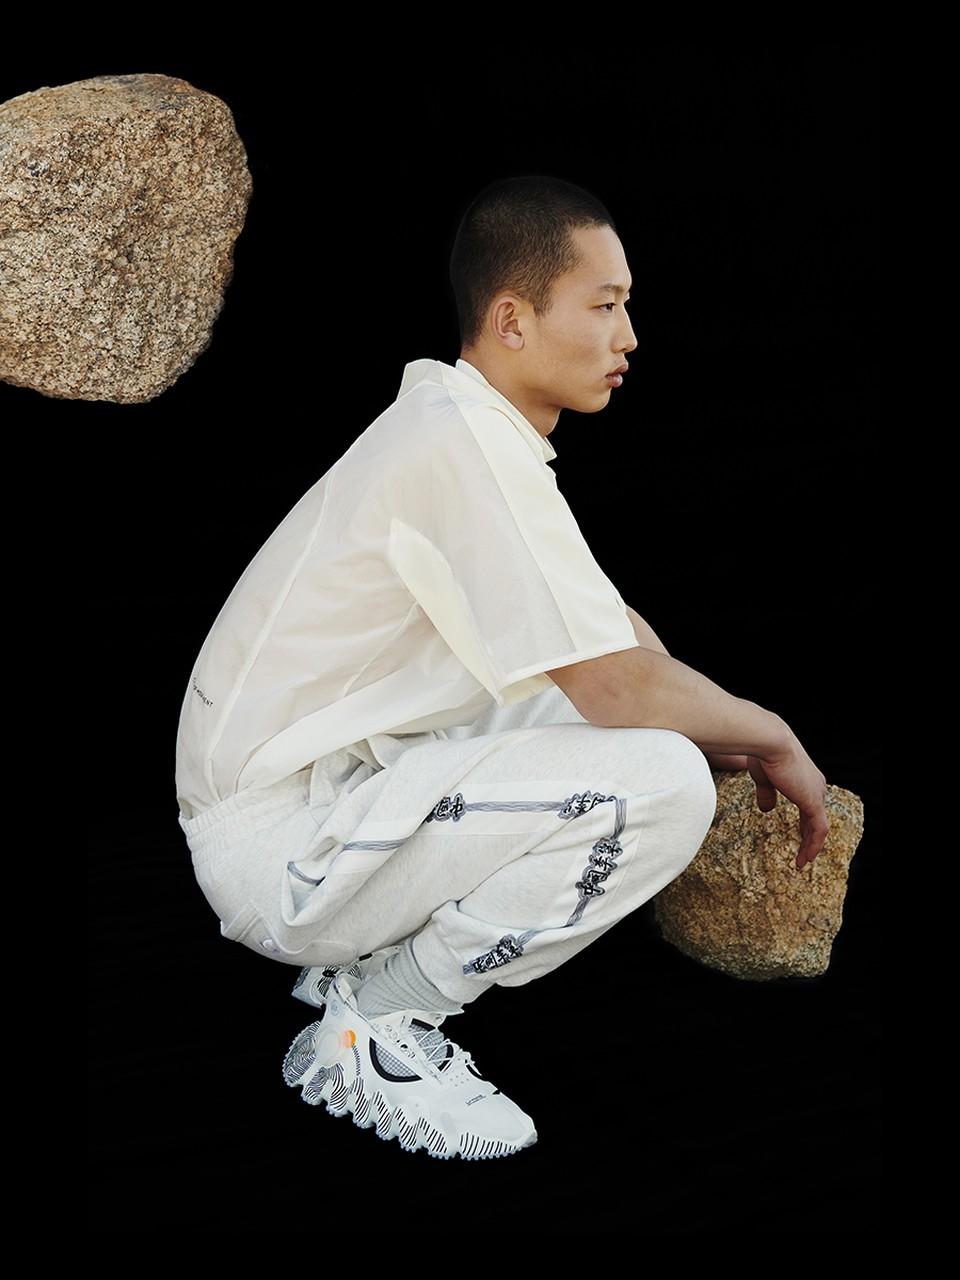 li-ning-ss21-dtf-magazine-05